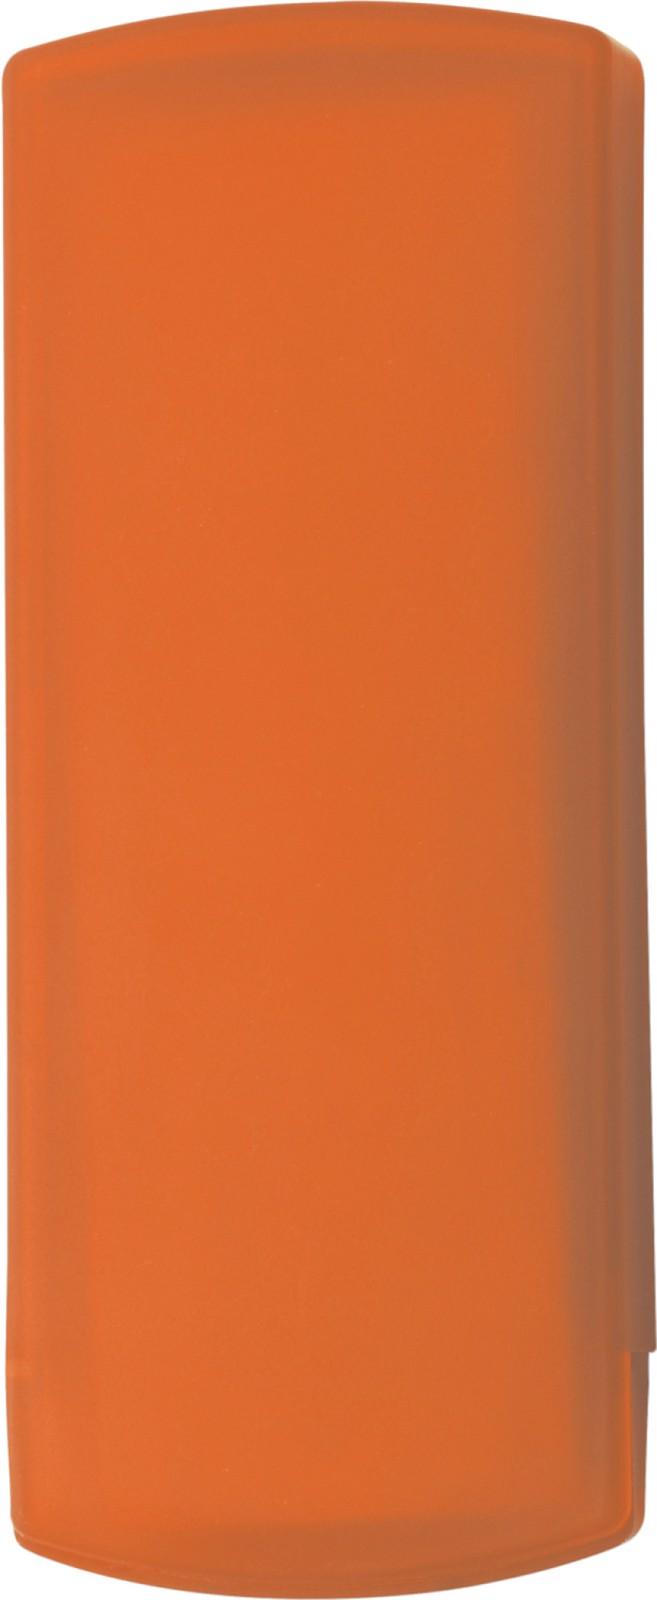 Plastic case with plasters - Orange